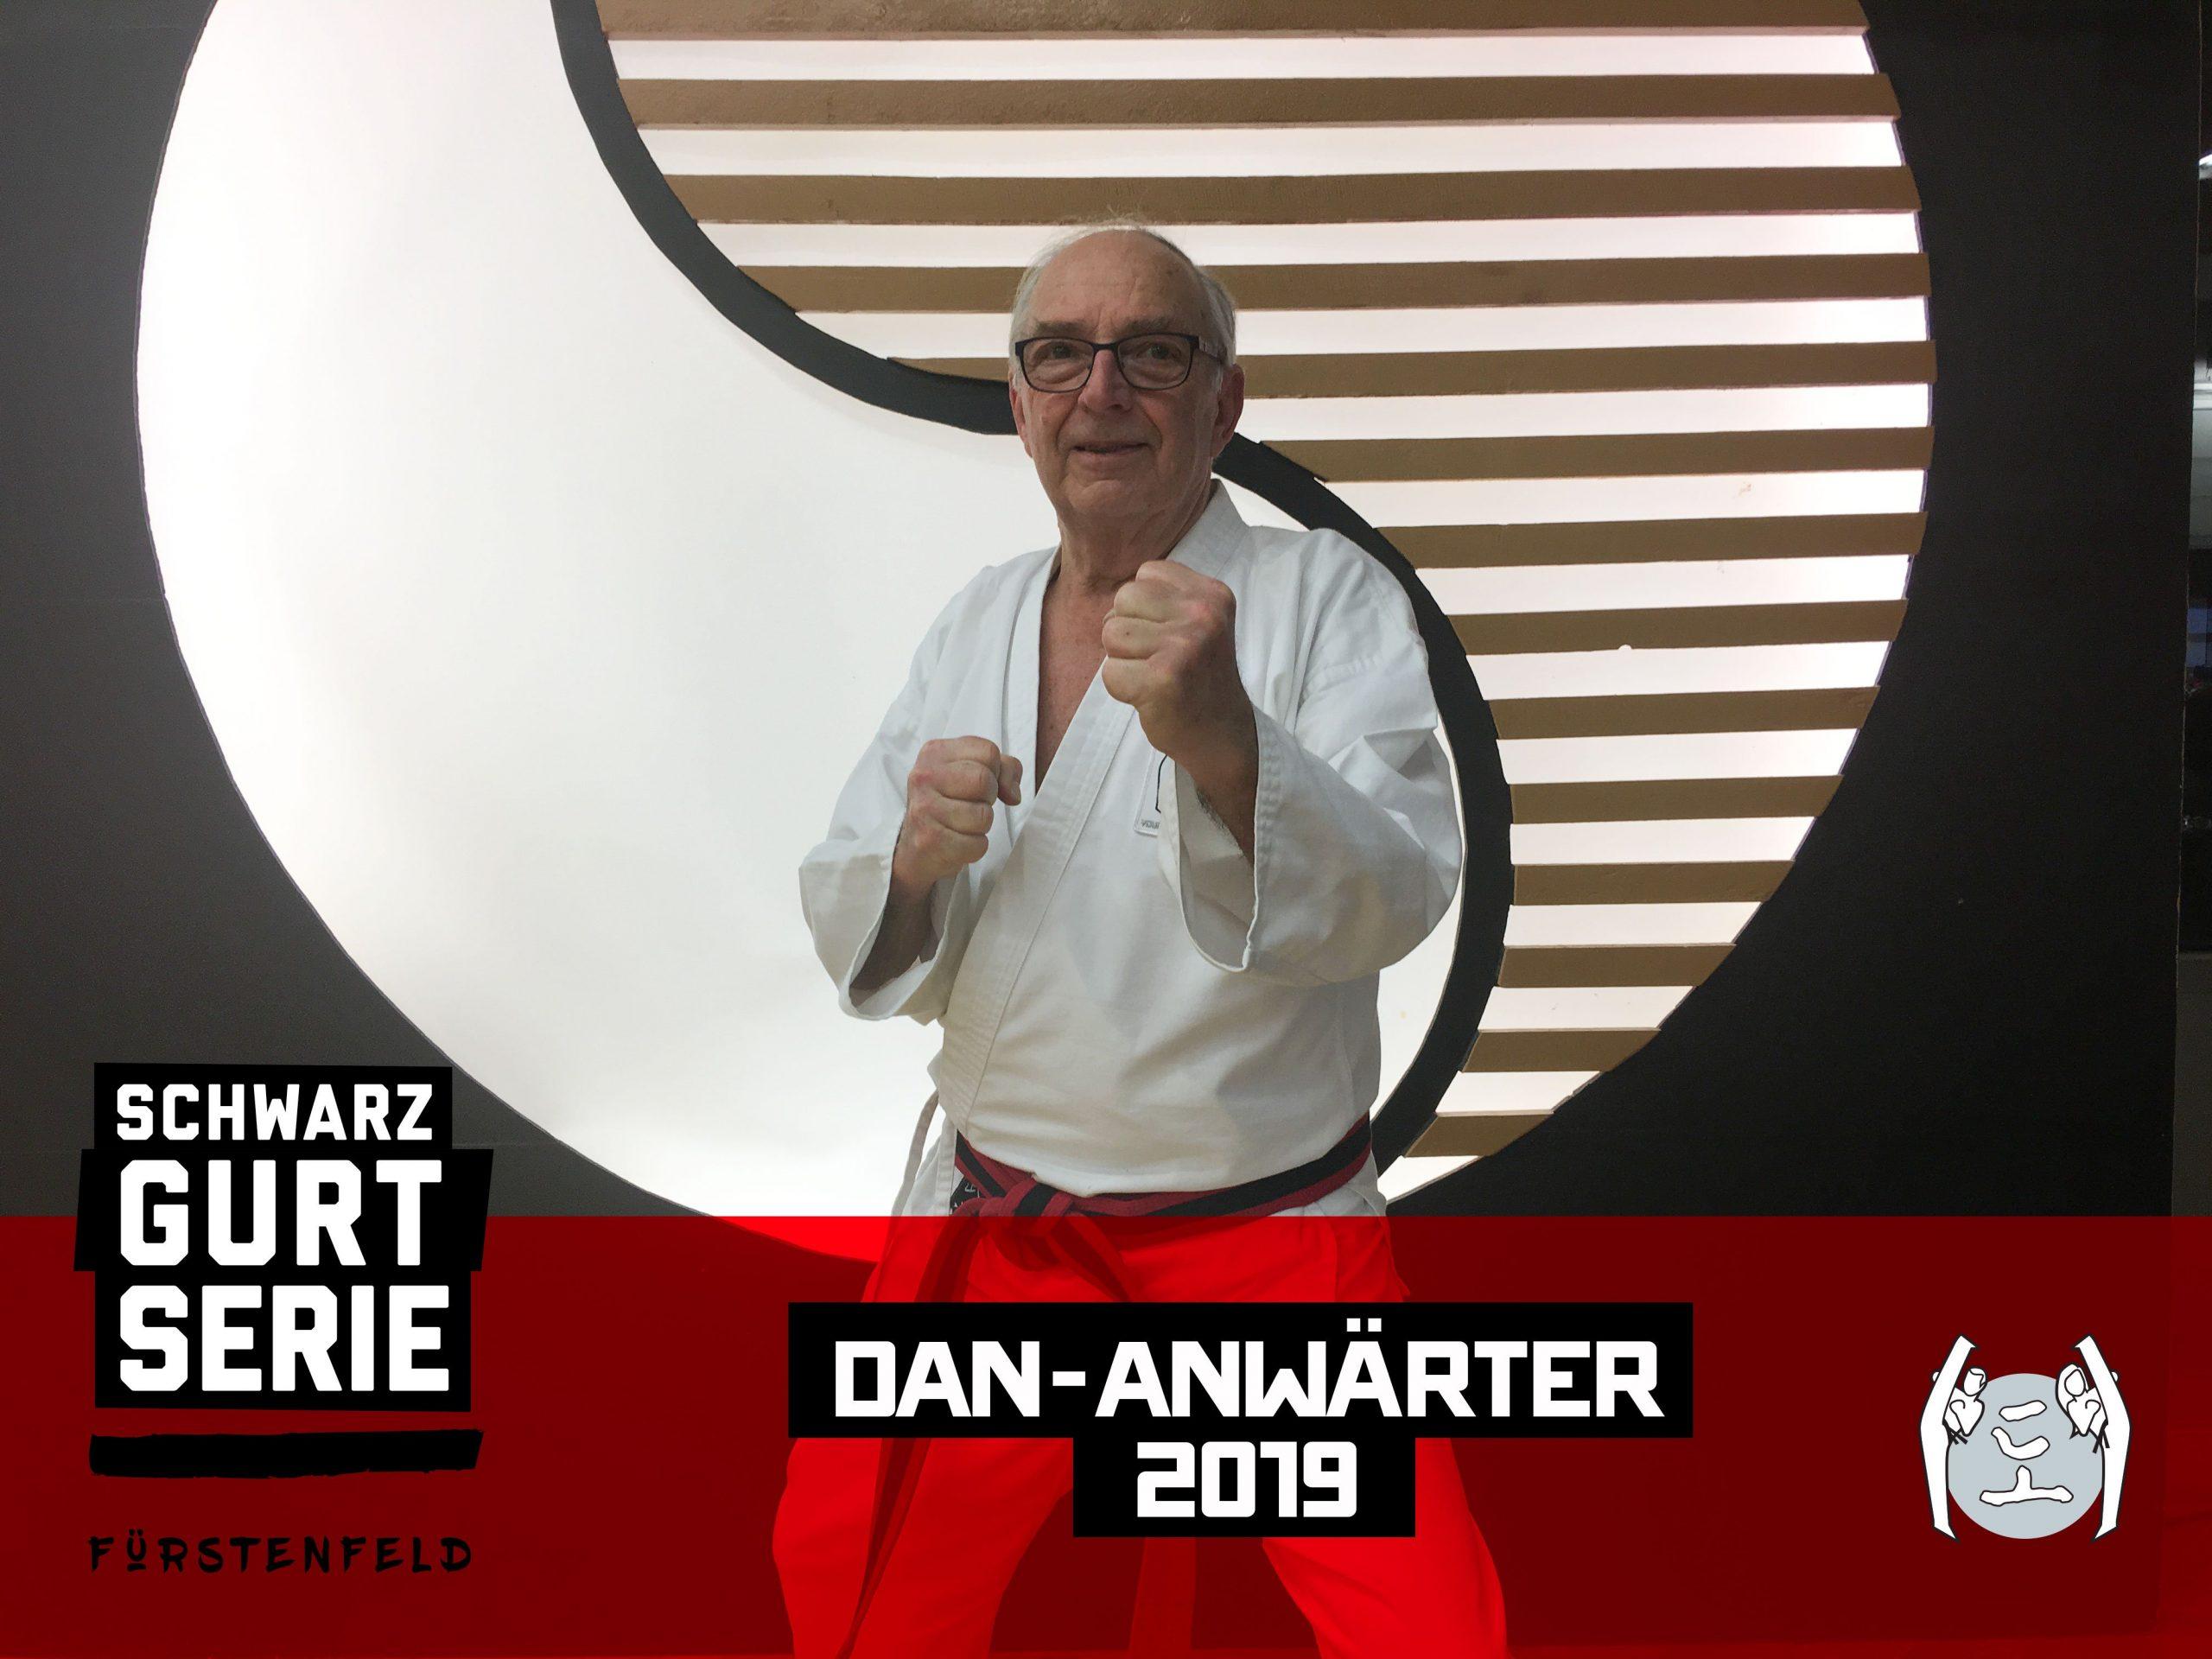 YOUNG-UNG Taekwondo Kampfsport Schwarzgurt Serie Gerd Peka Dan-Anwärter Training Camp Fürstenfeld